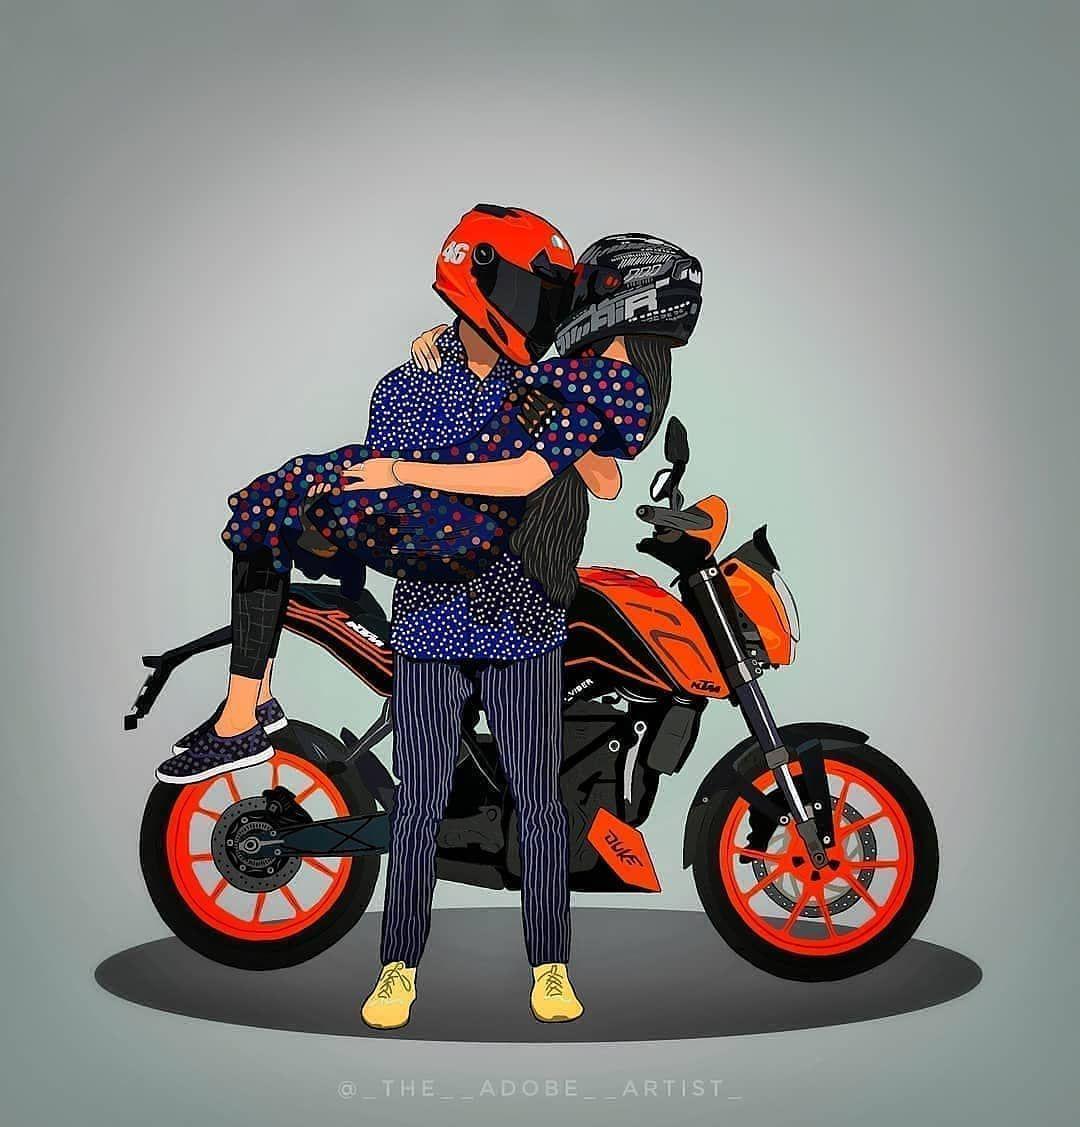 Ktm India 300k On Instagram Follow Ktm Duke Shootout Use Our Hashtag Ktmdukeshootout I In 2021 Bike Drawing Cartoon Wallpaper Hd Animated Love Images Get ktm duke couple wallpaper png